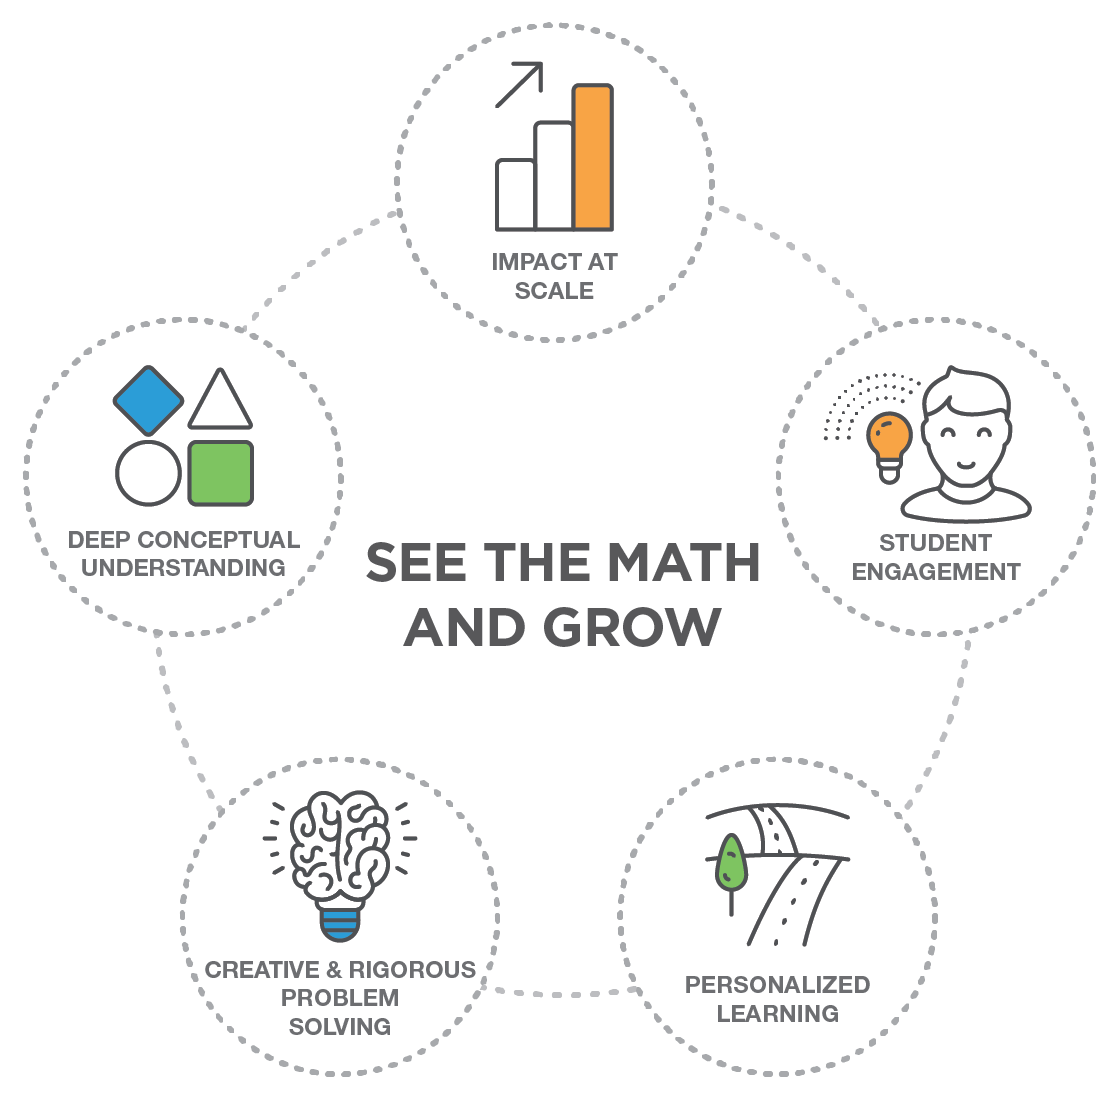 st-math-see-the-math-and-grow-circle.png